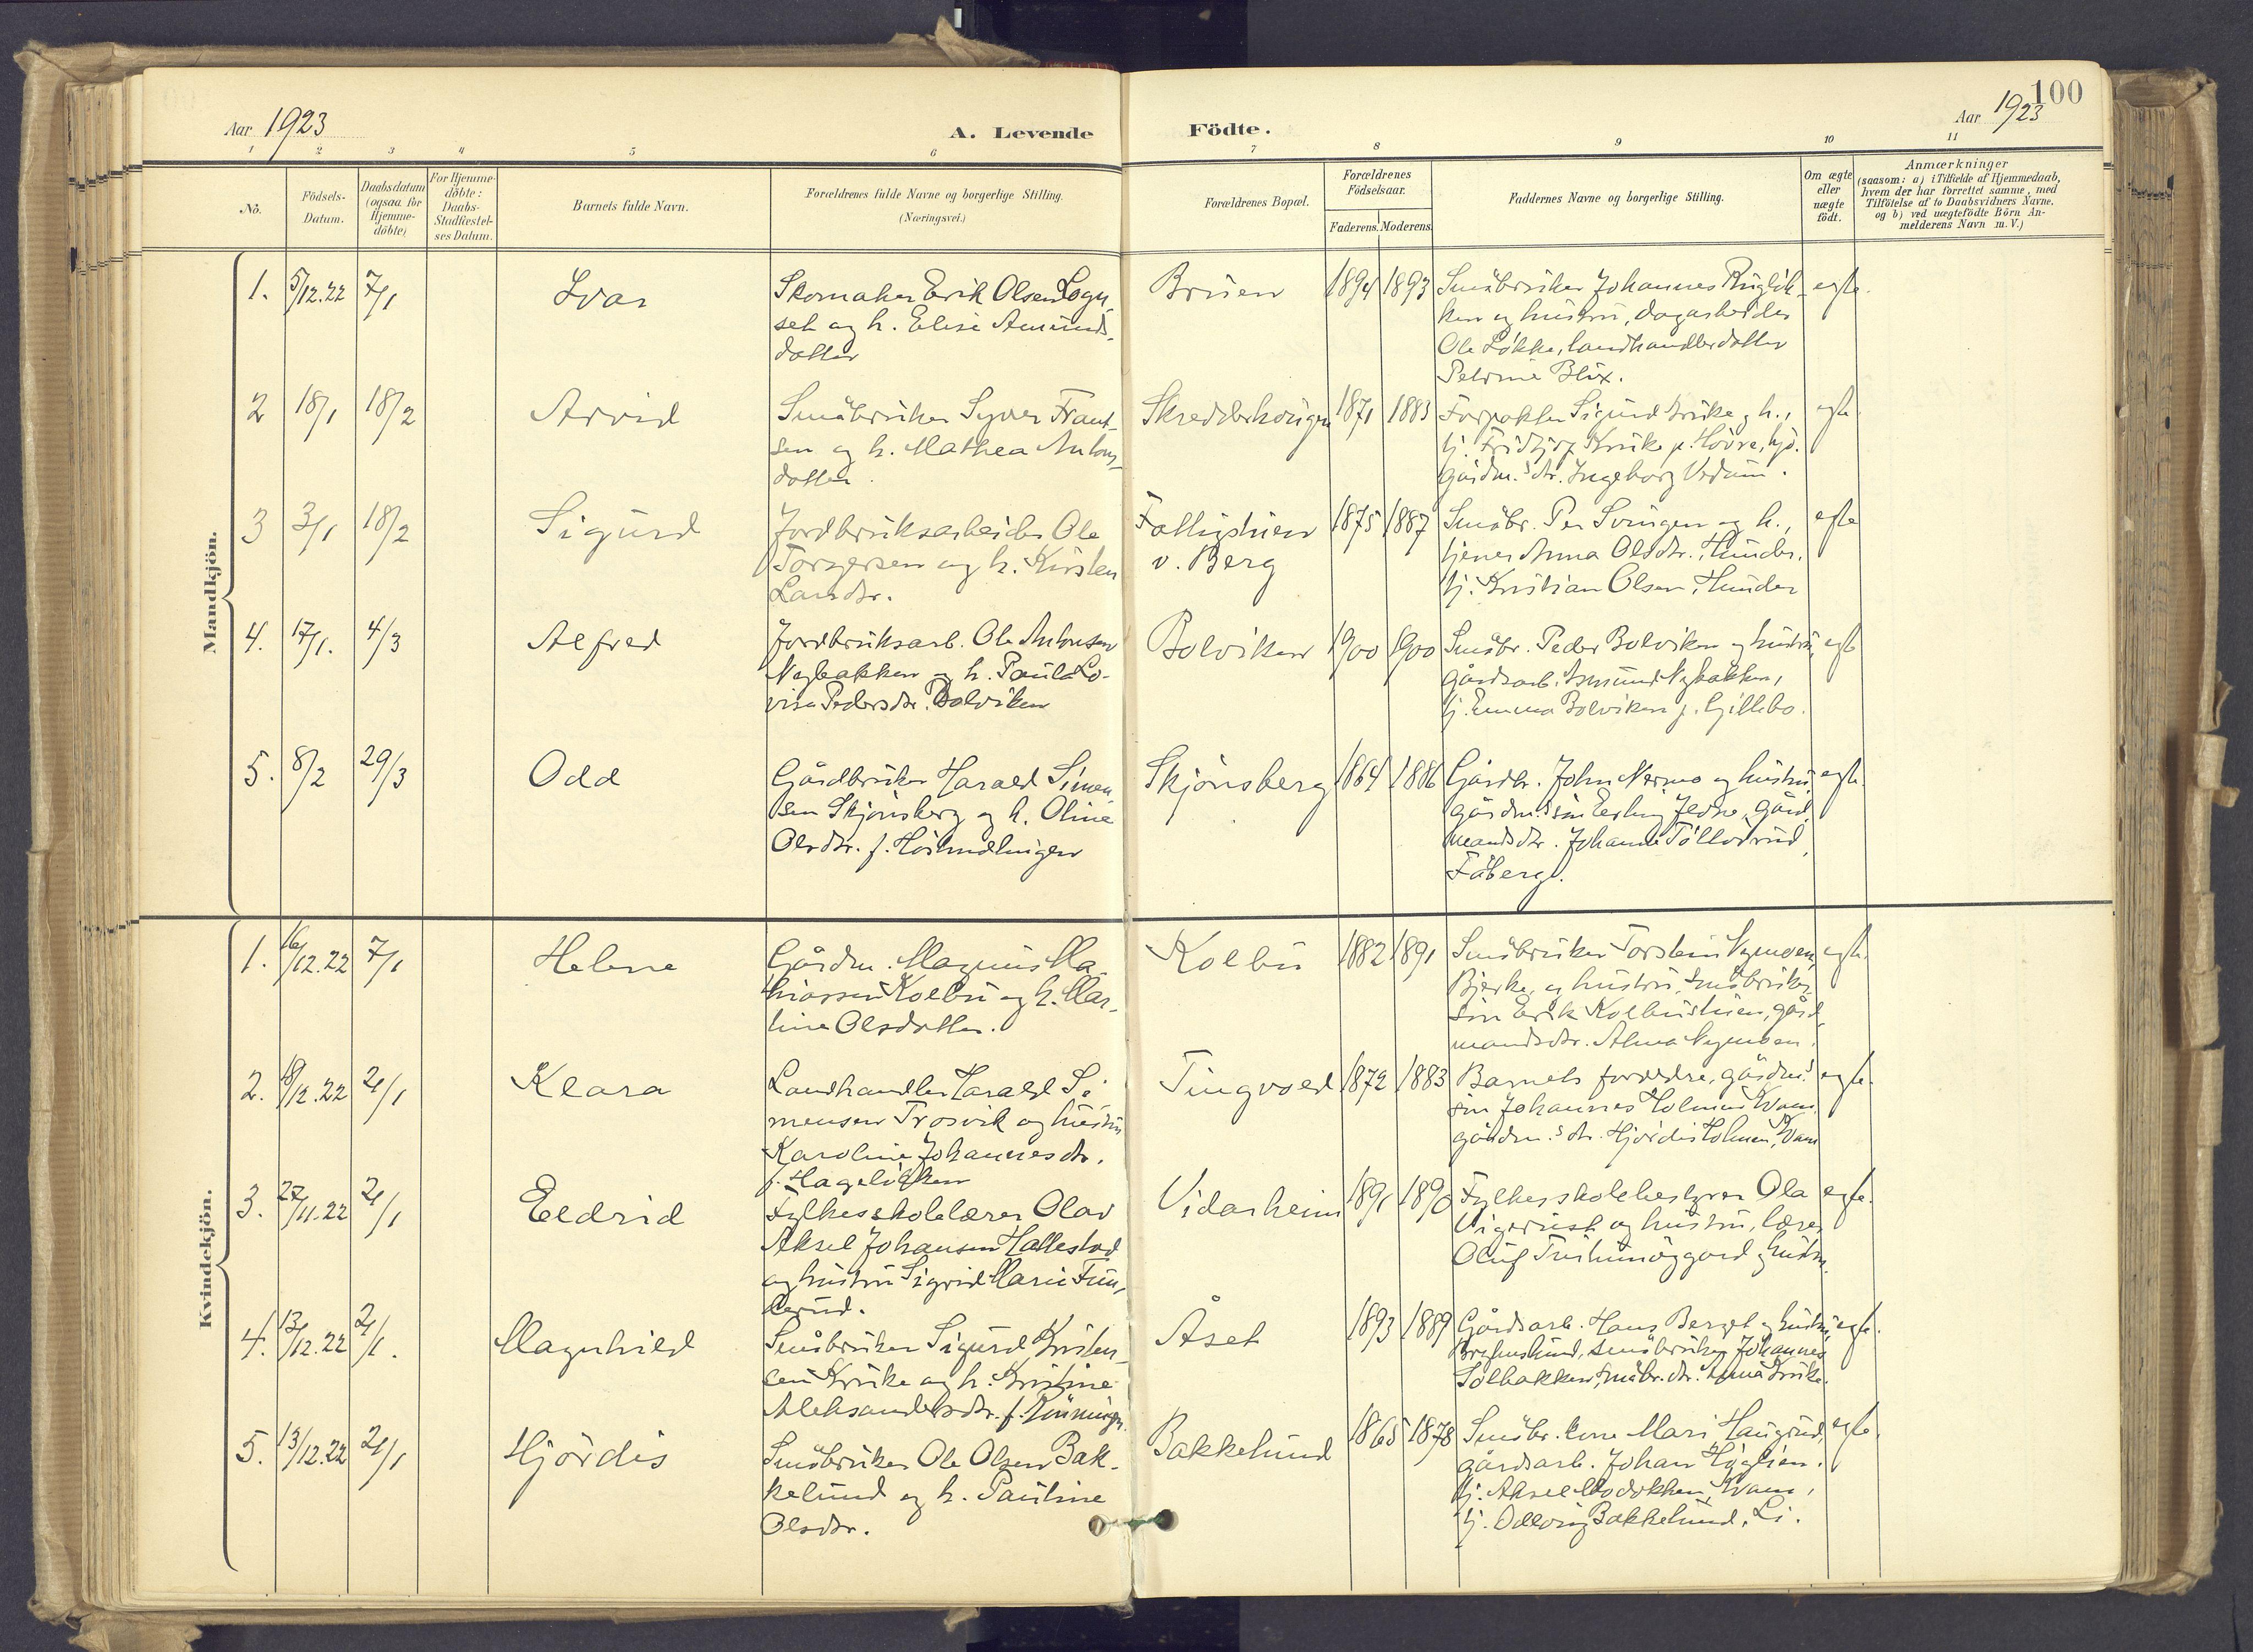 SAH, Øyer prestekontor, Ministerialbok nr. 12, 1897-1920, s. 100